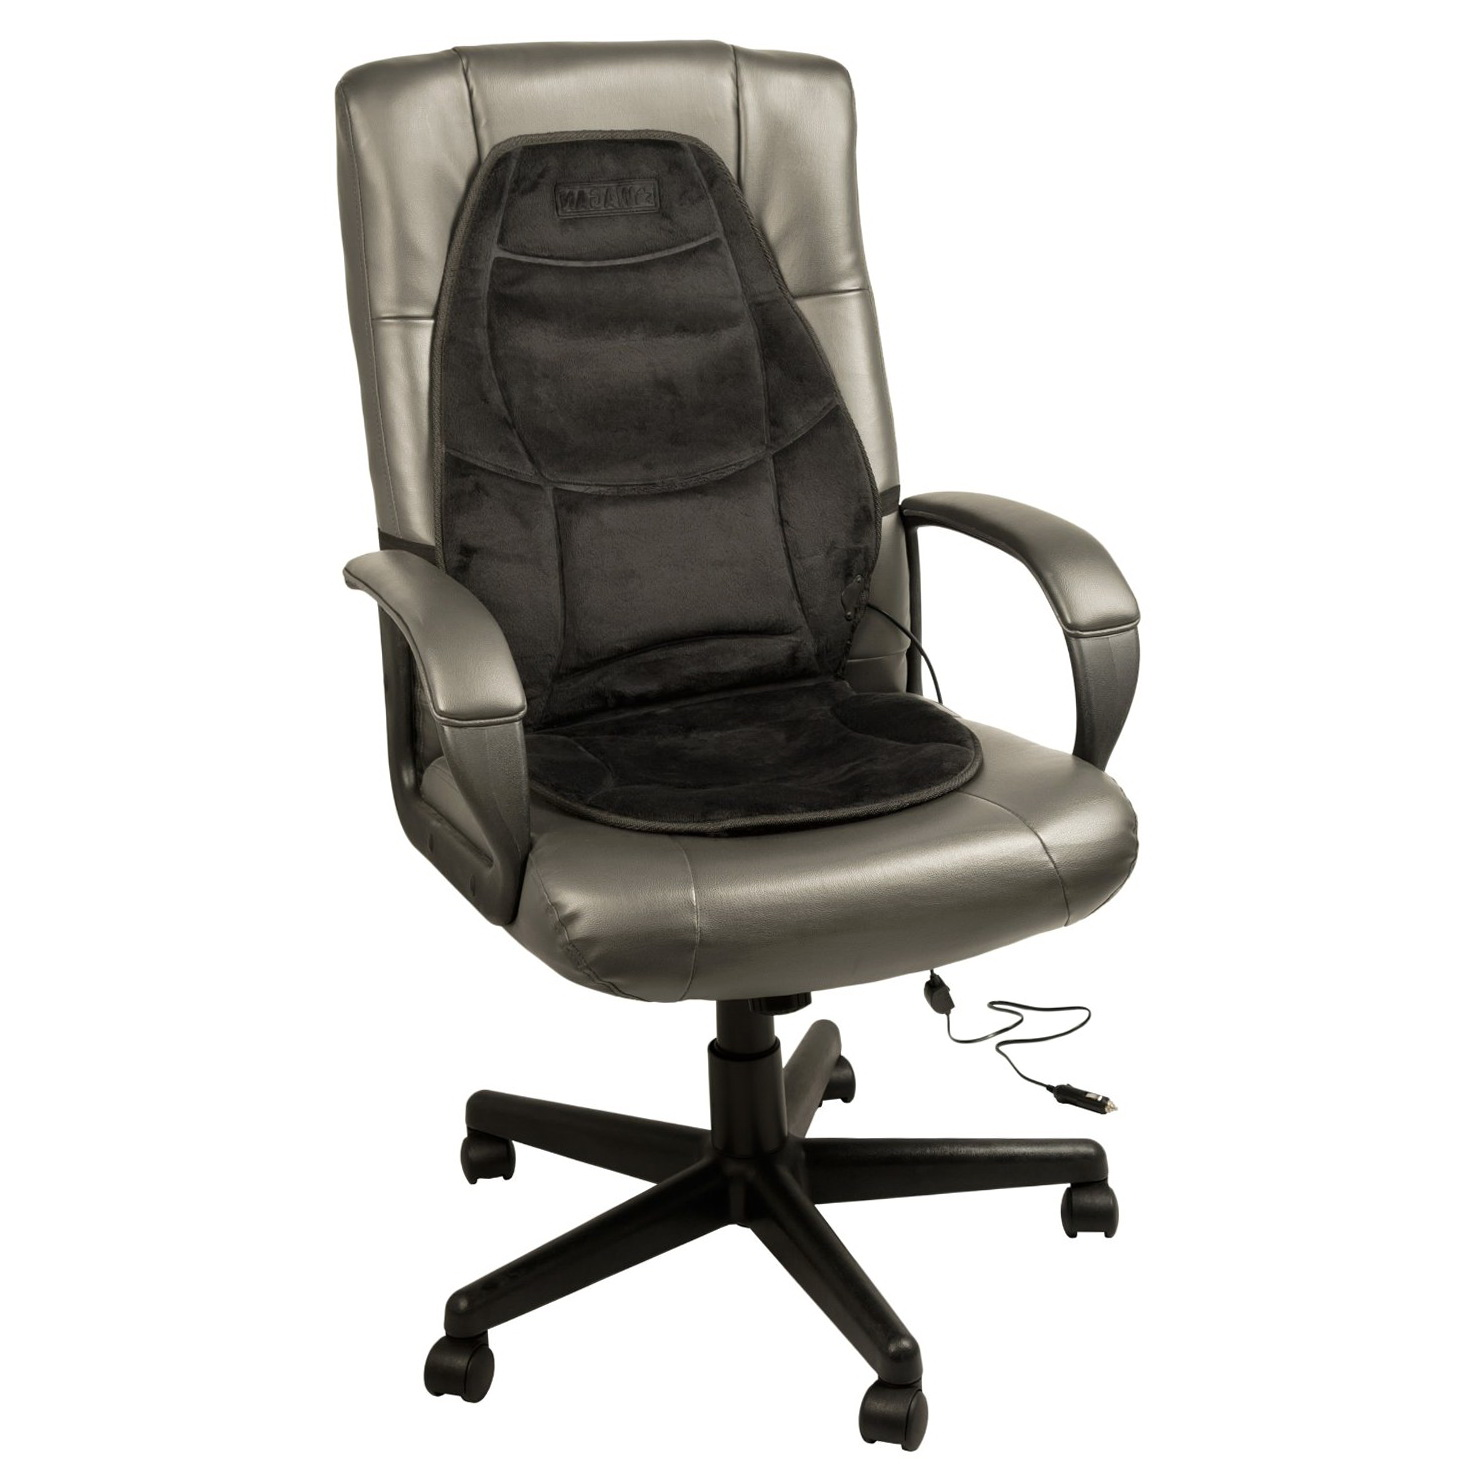 Wagan Heated Seat Cushion Review